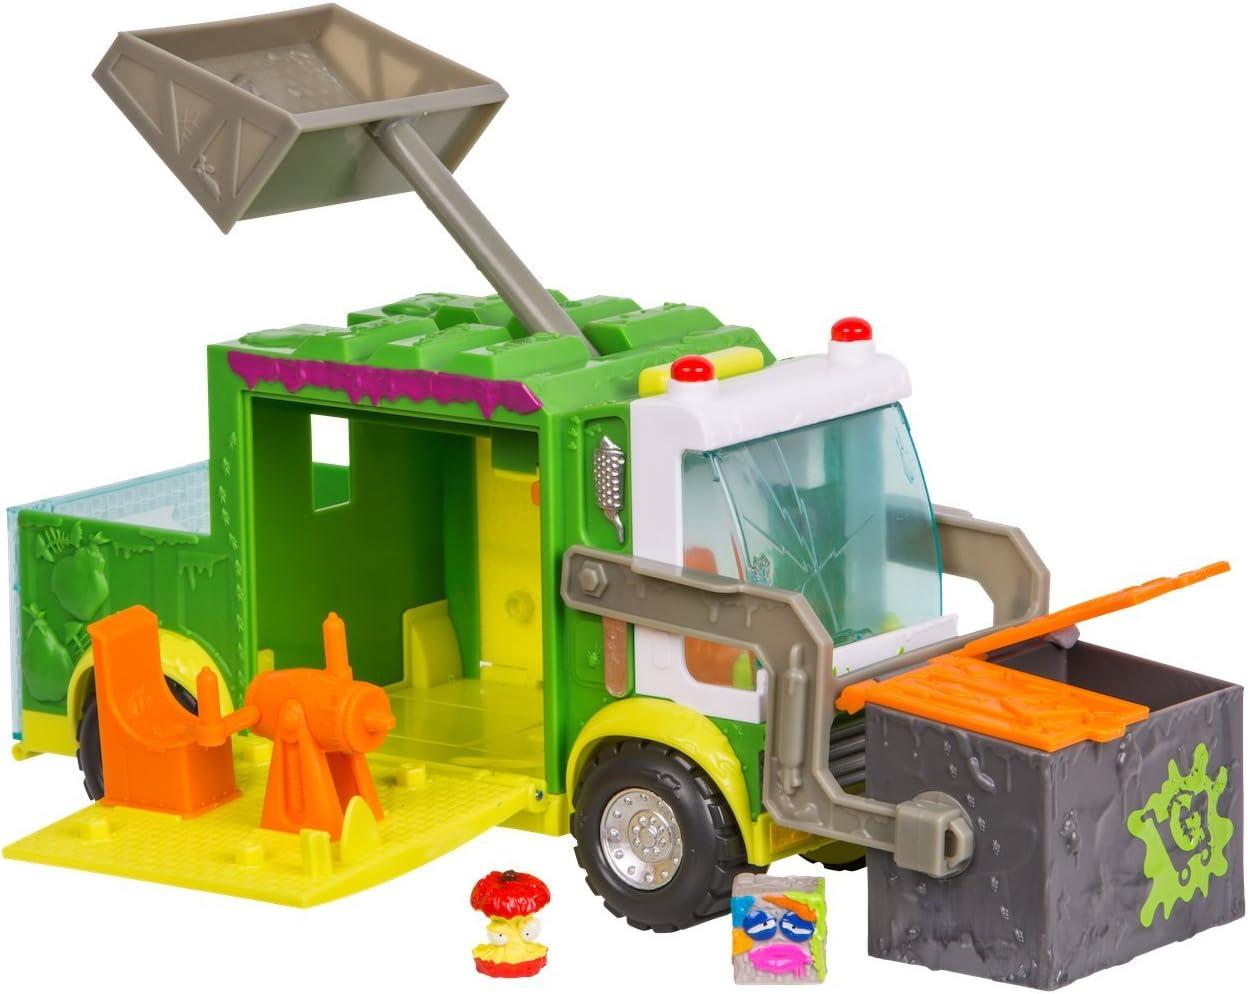 Grossery Gang Muck Chuck Garbage Truck